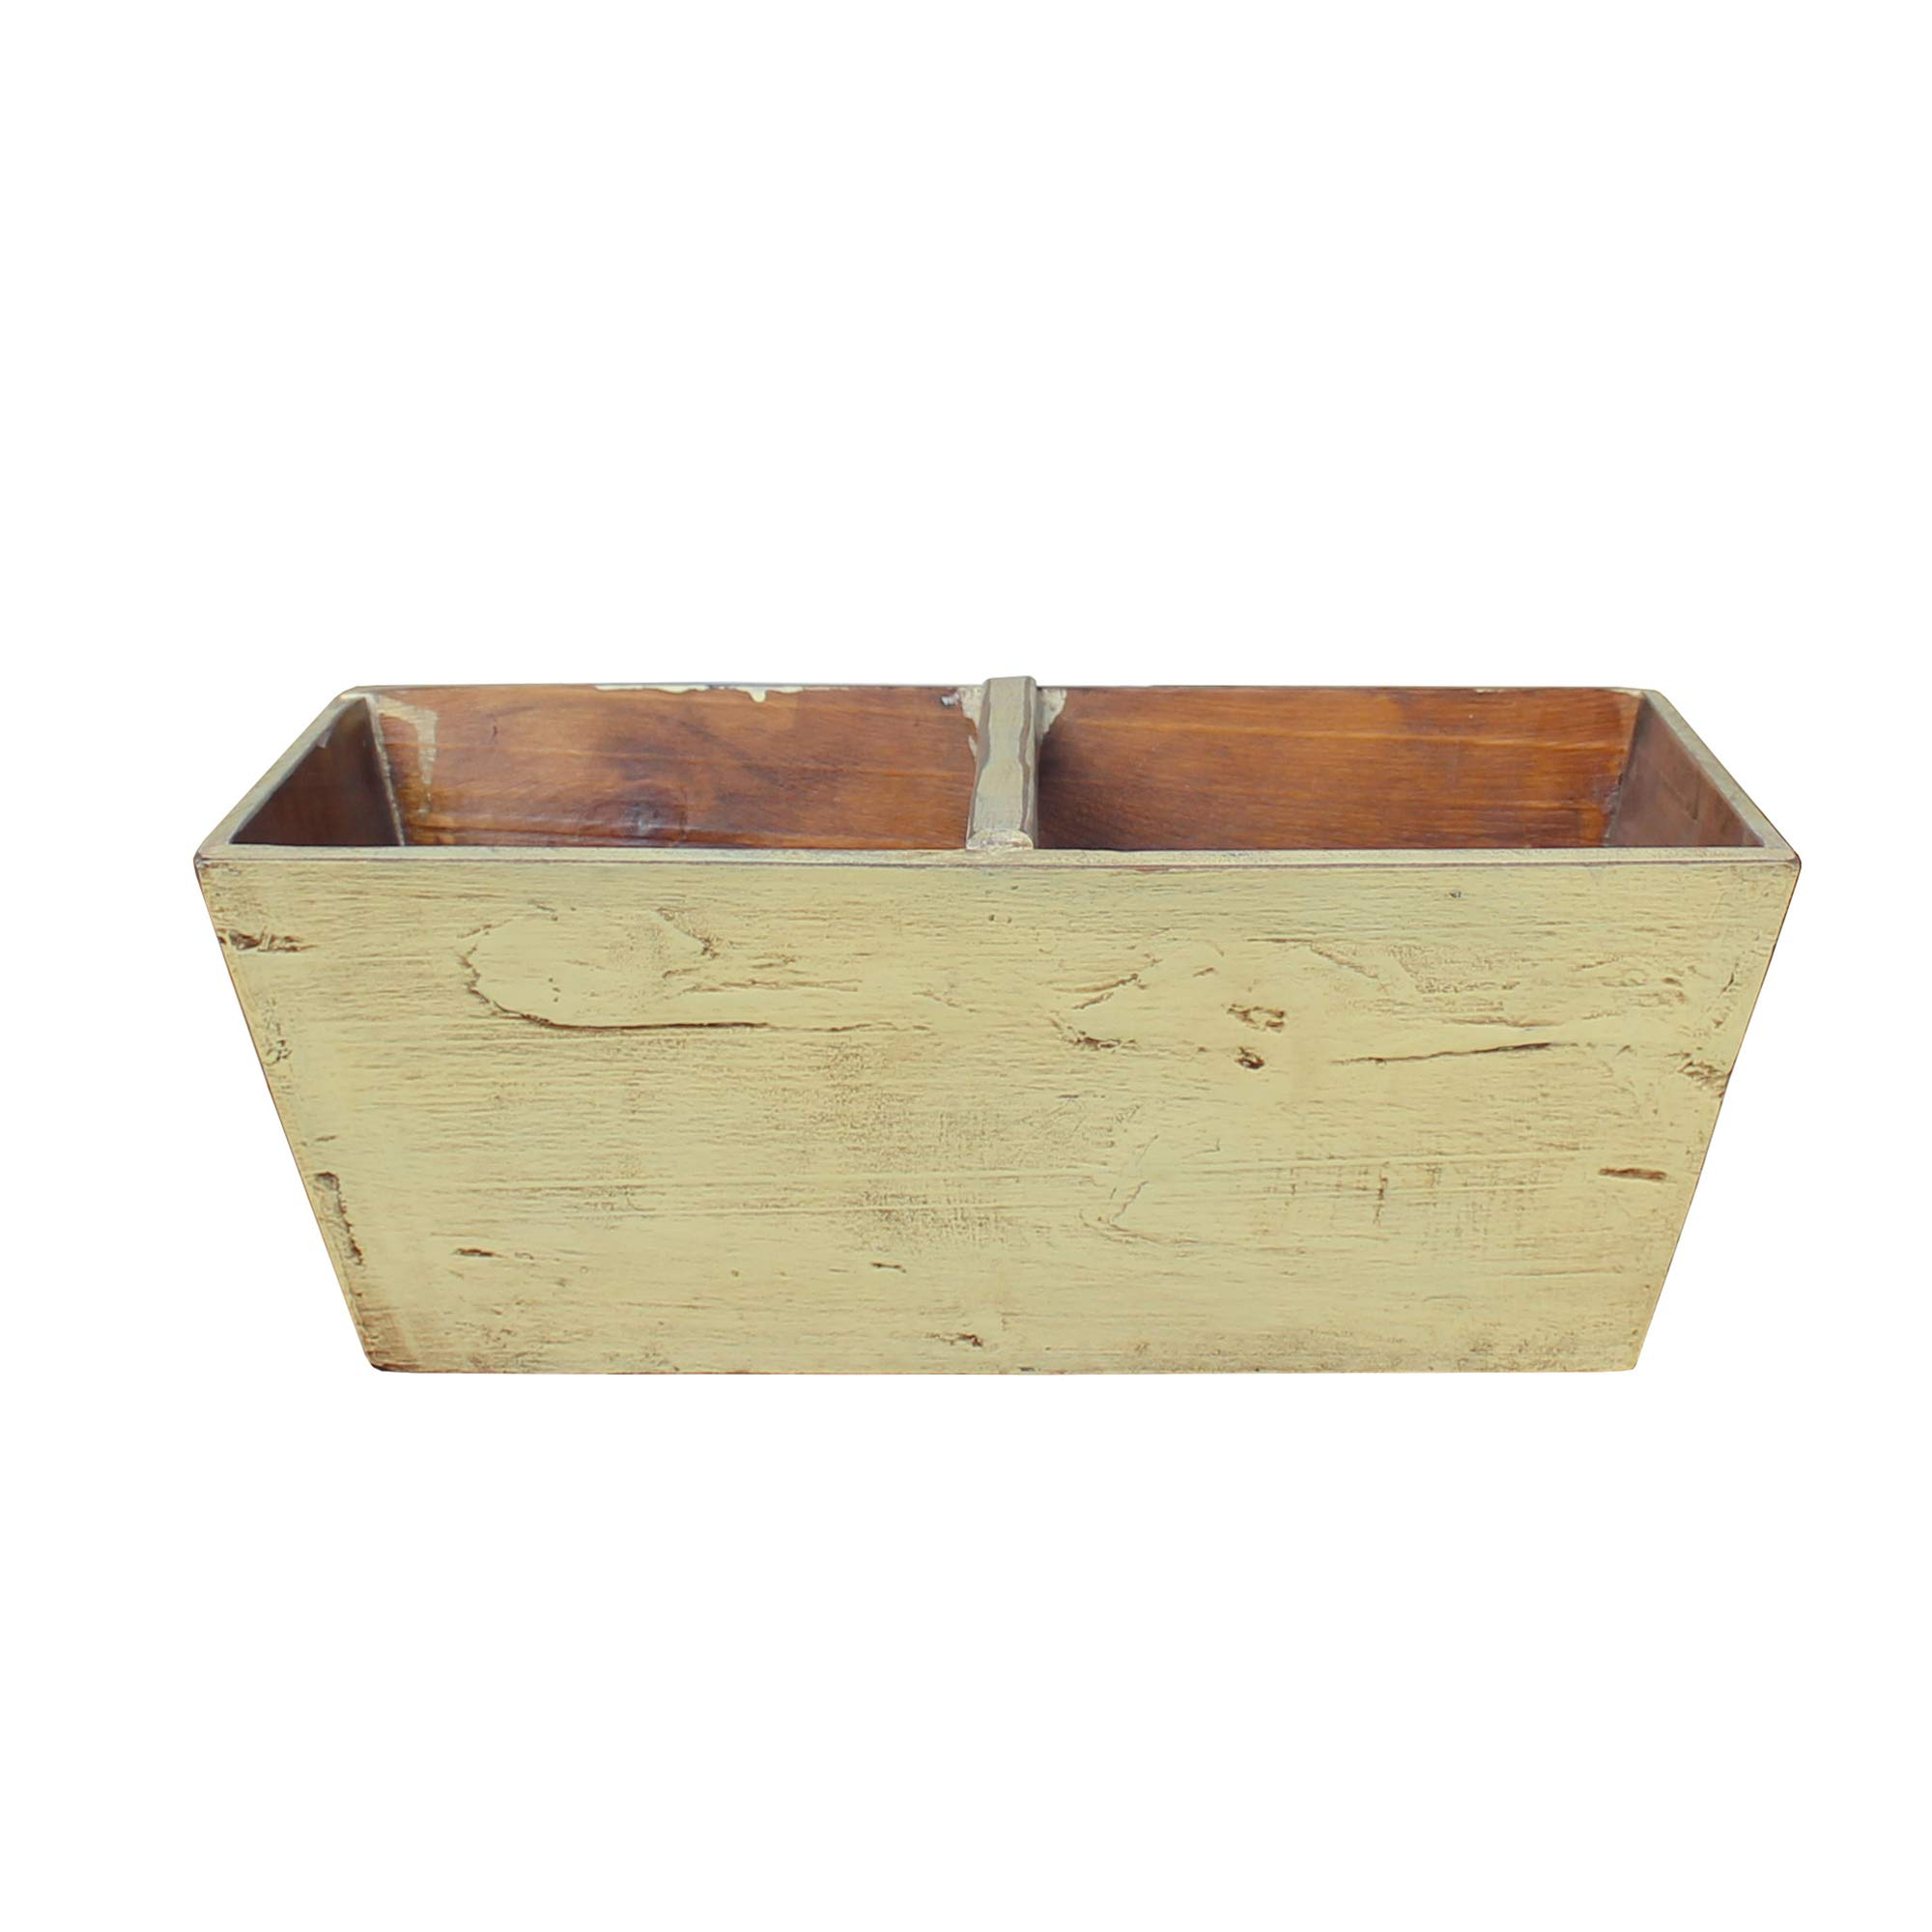 Vintage Kiwi Polish Box Wooden Crate Shop Display Gift Hamper